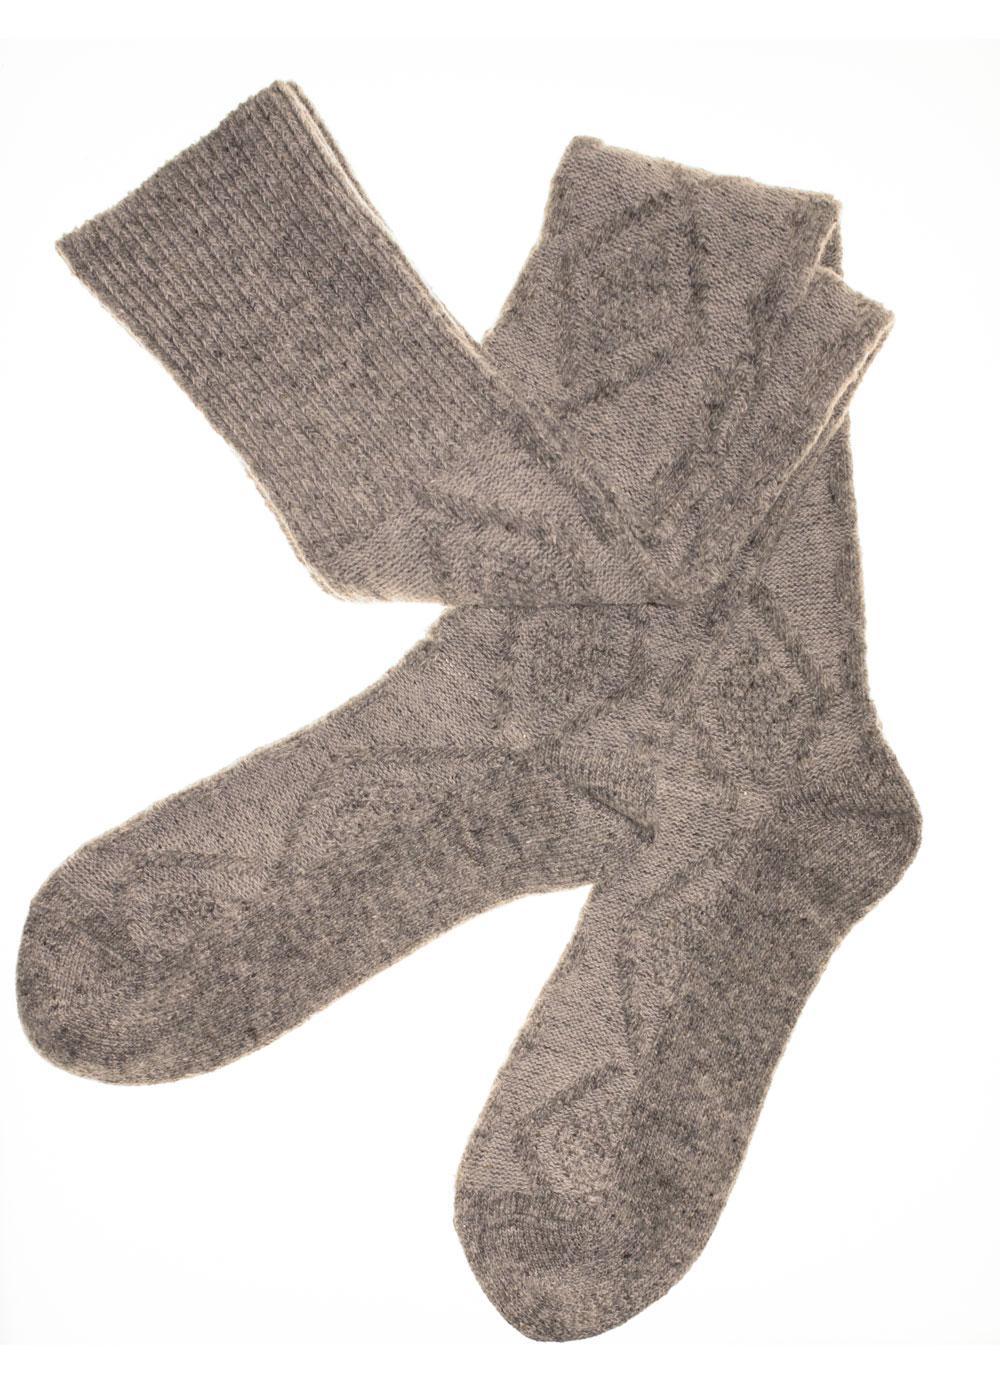 Aran Knee-High Socks | Blarney